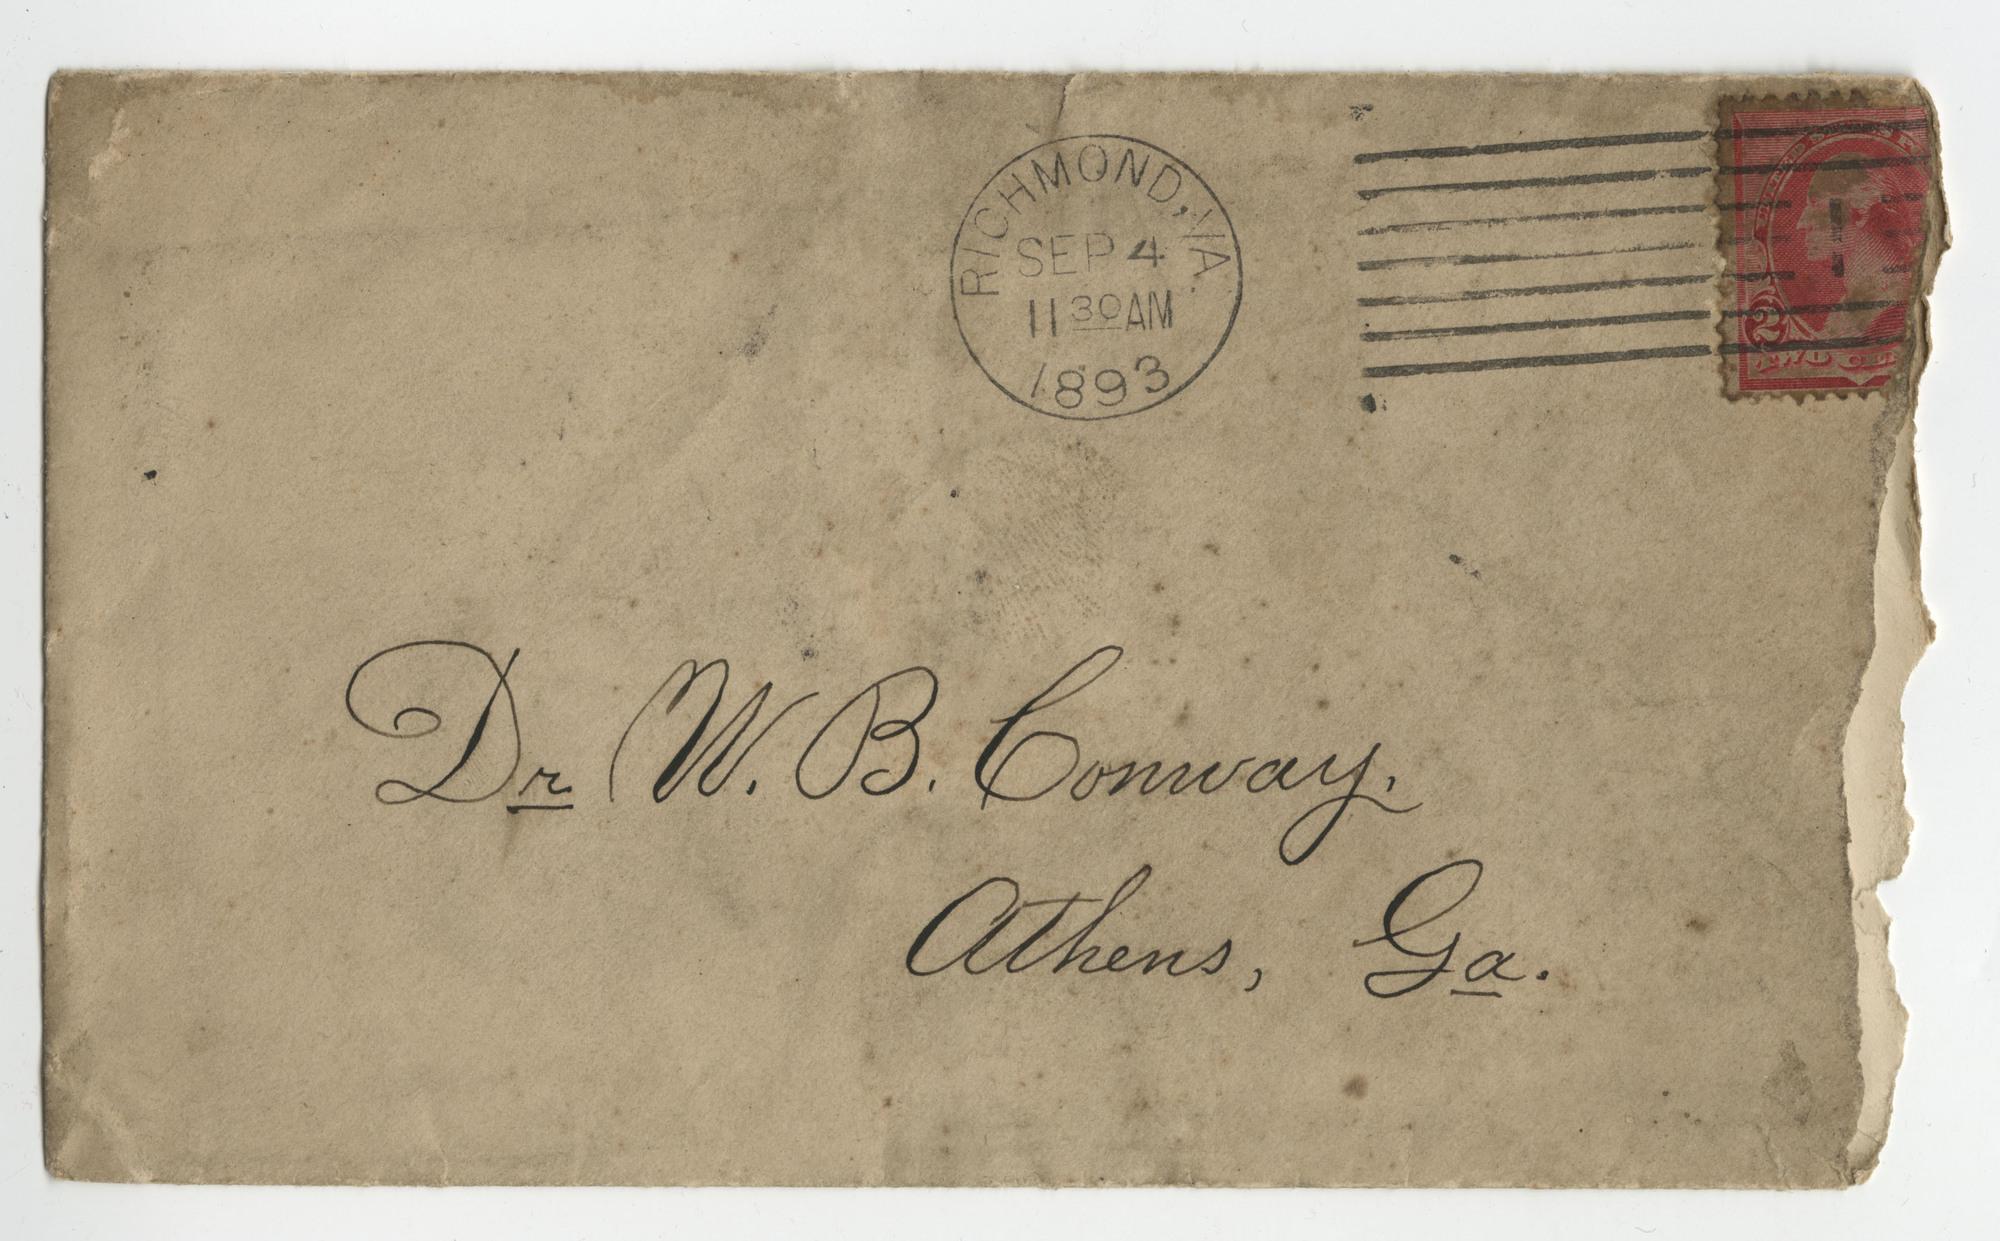 http://spec.lib.vt.edu/pickup/Omeka_upload/Ms2012-039_ConwayCatlett_F1_Letter_1893_0903_enva.jpg